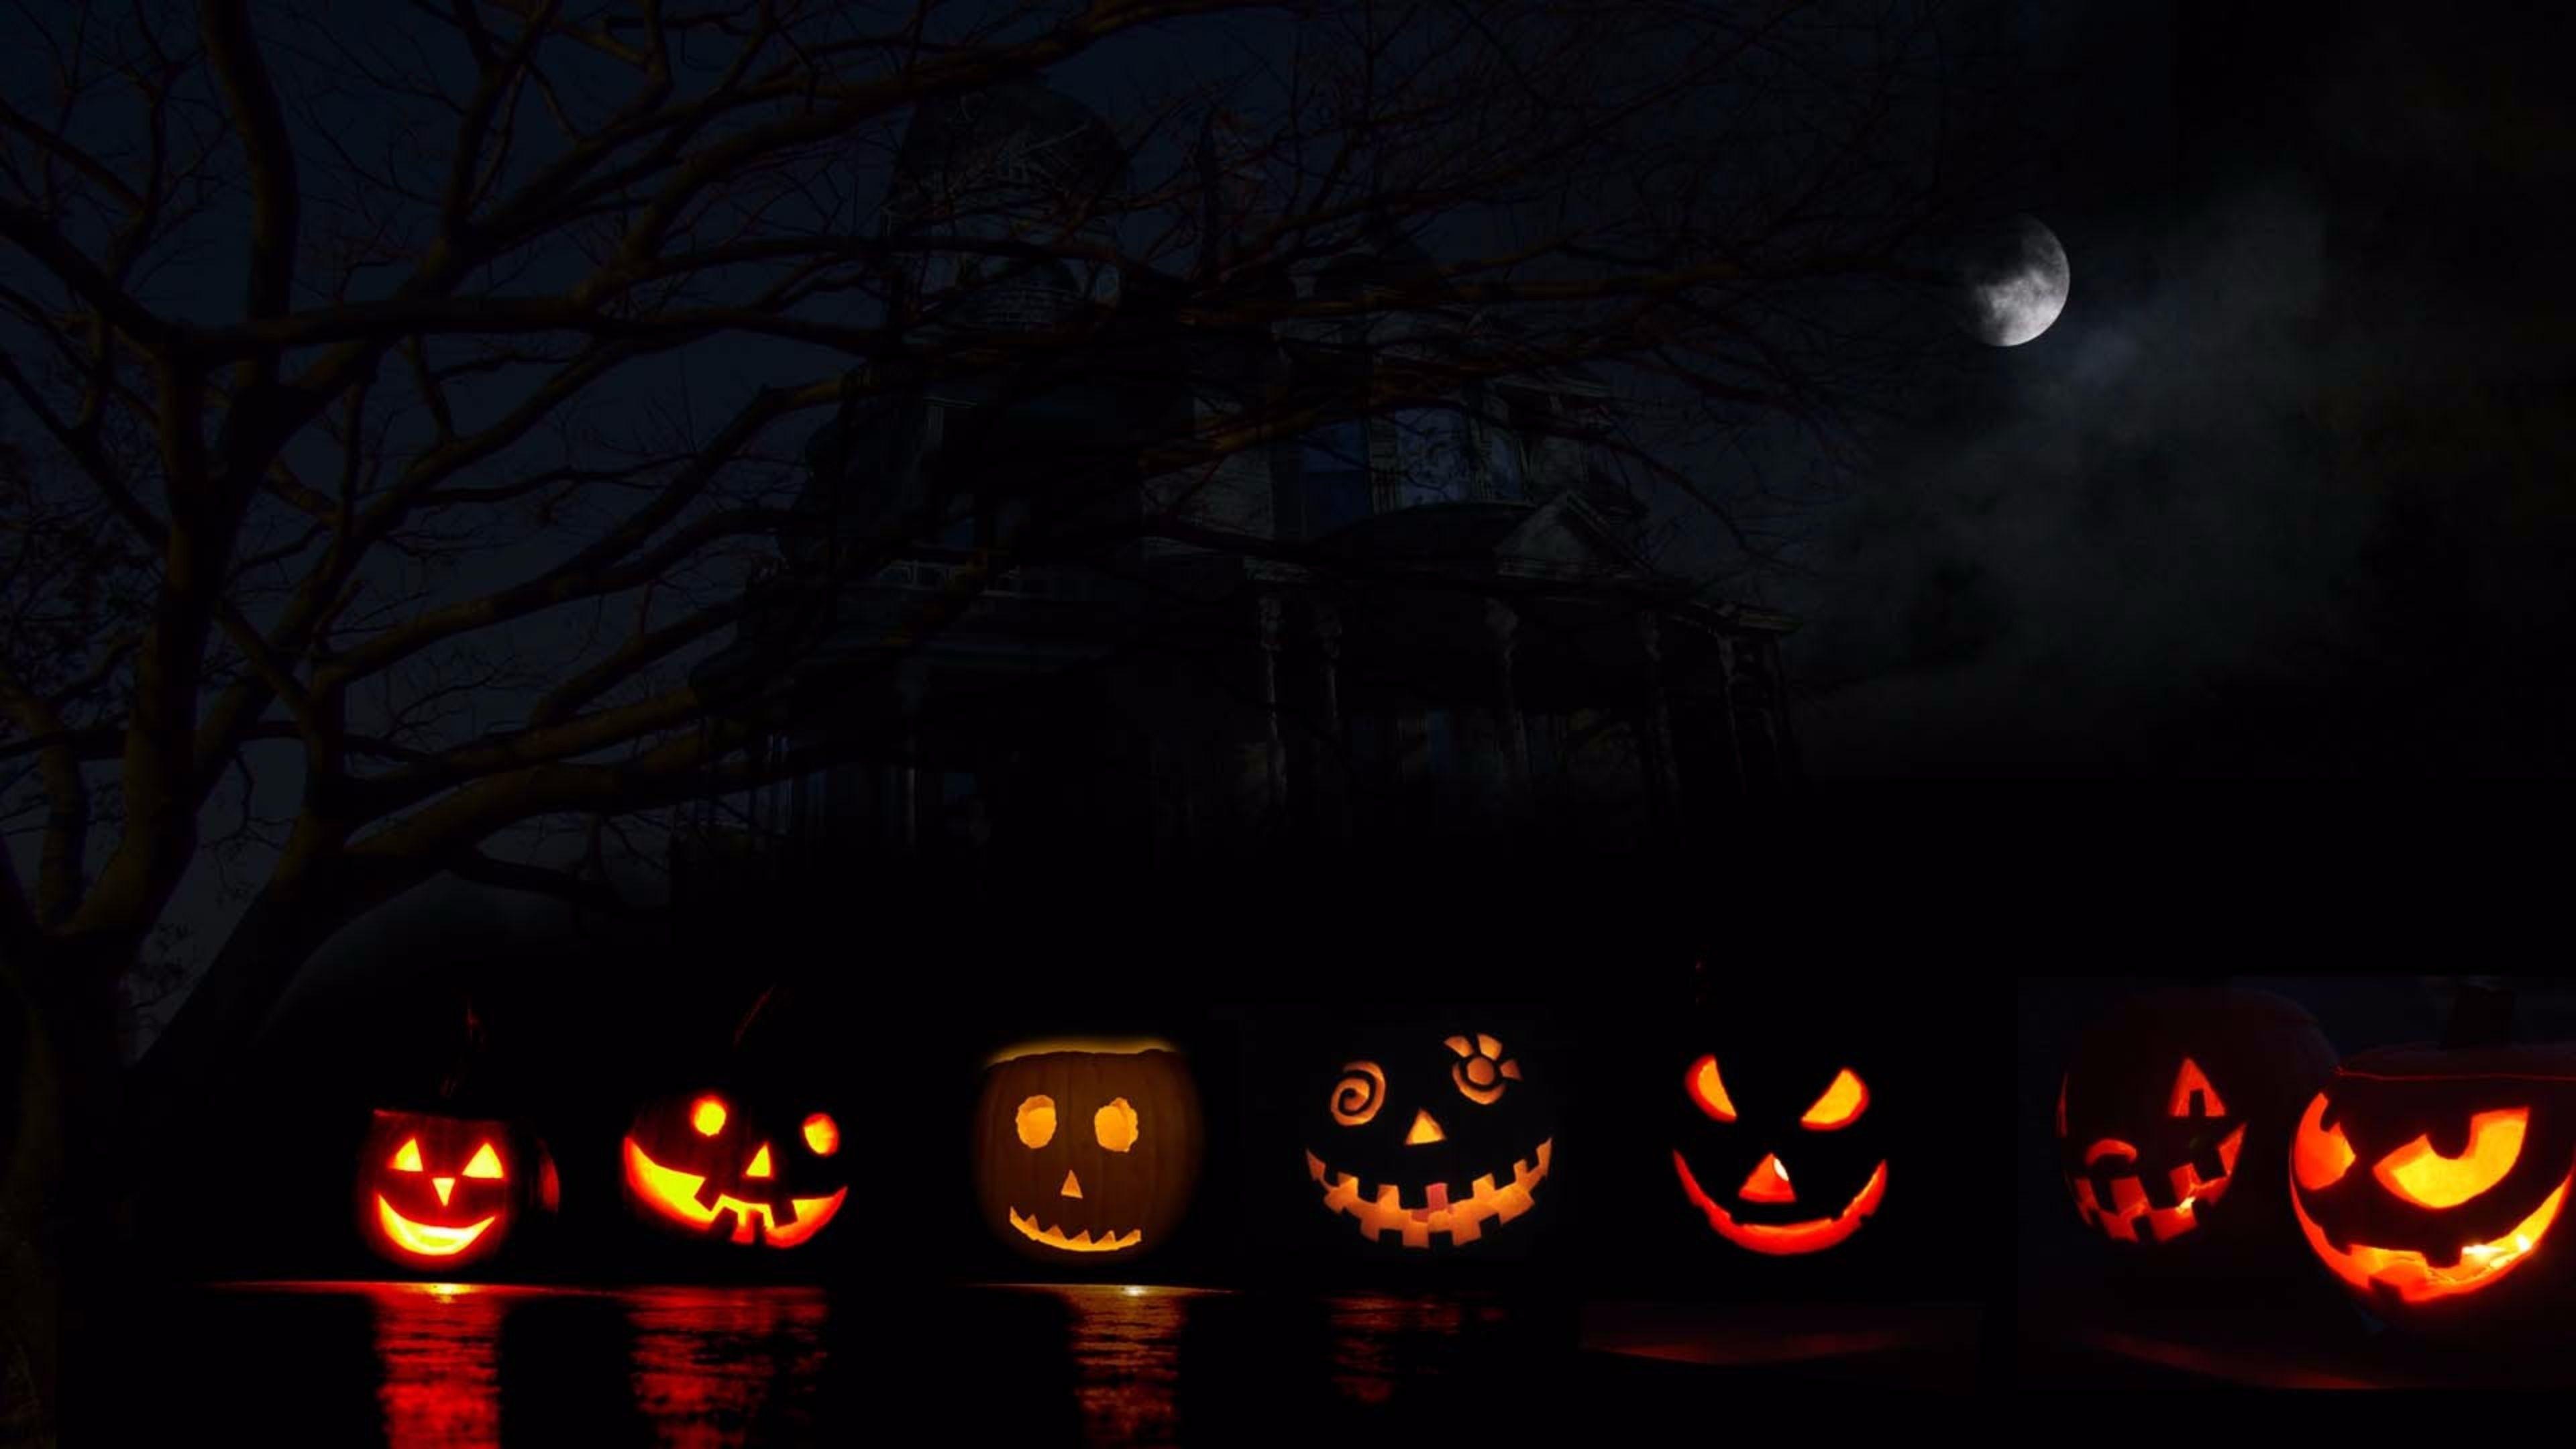 Res: 3840x2160, 7 Pumpkins 4K Halloween Wallpaper